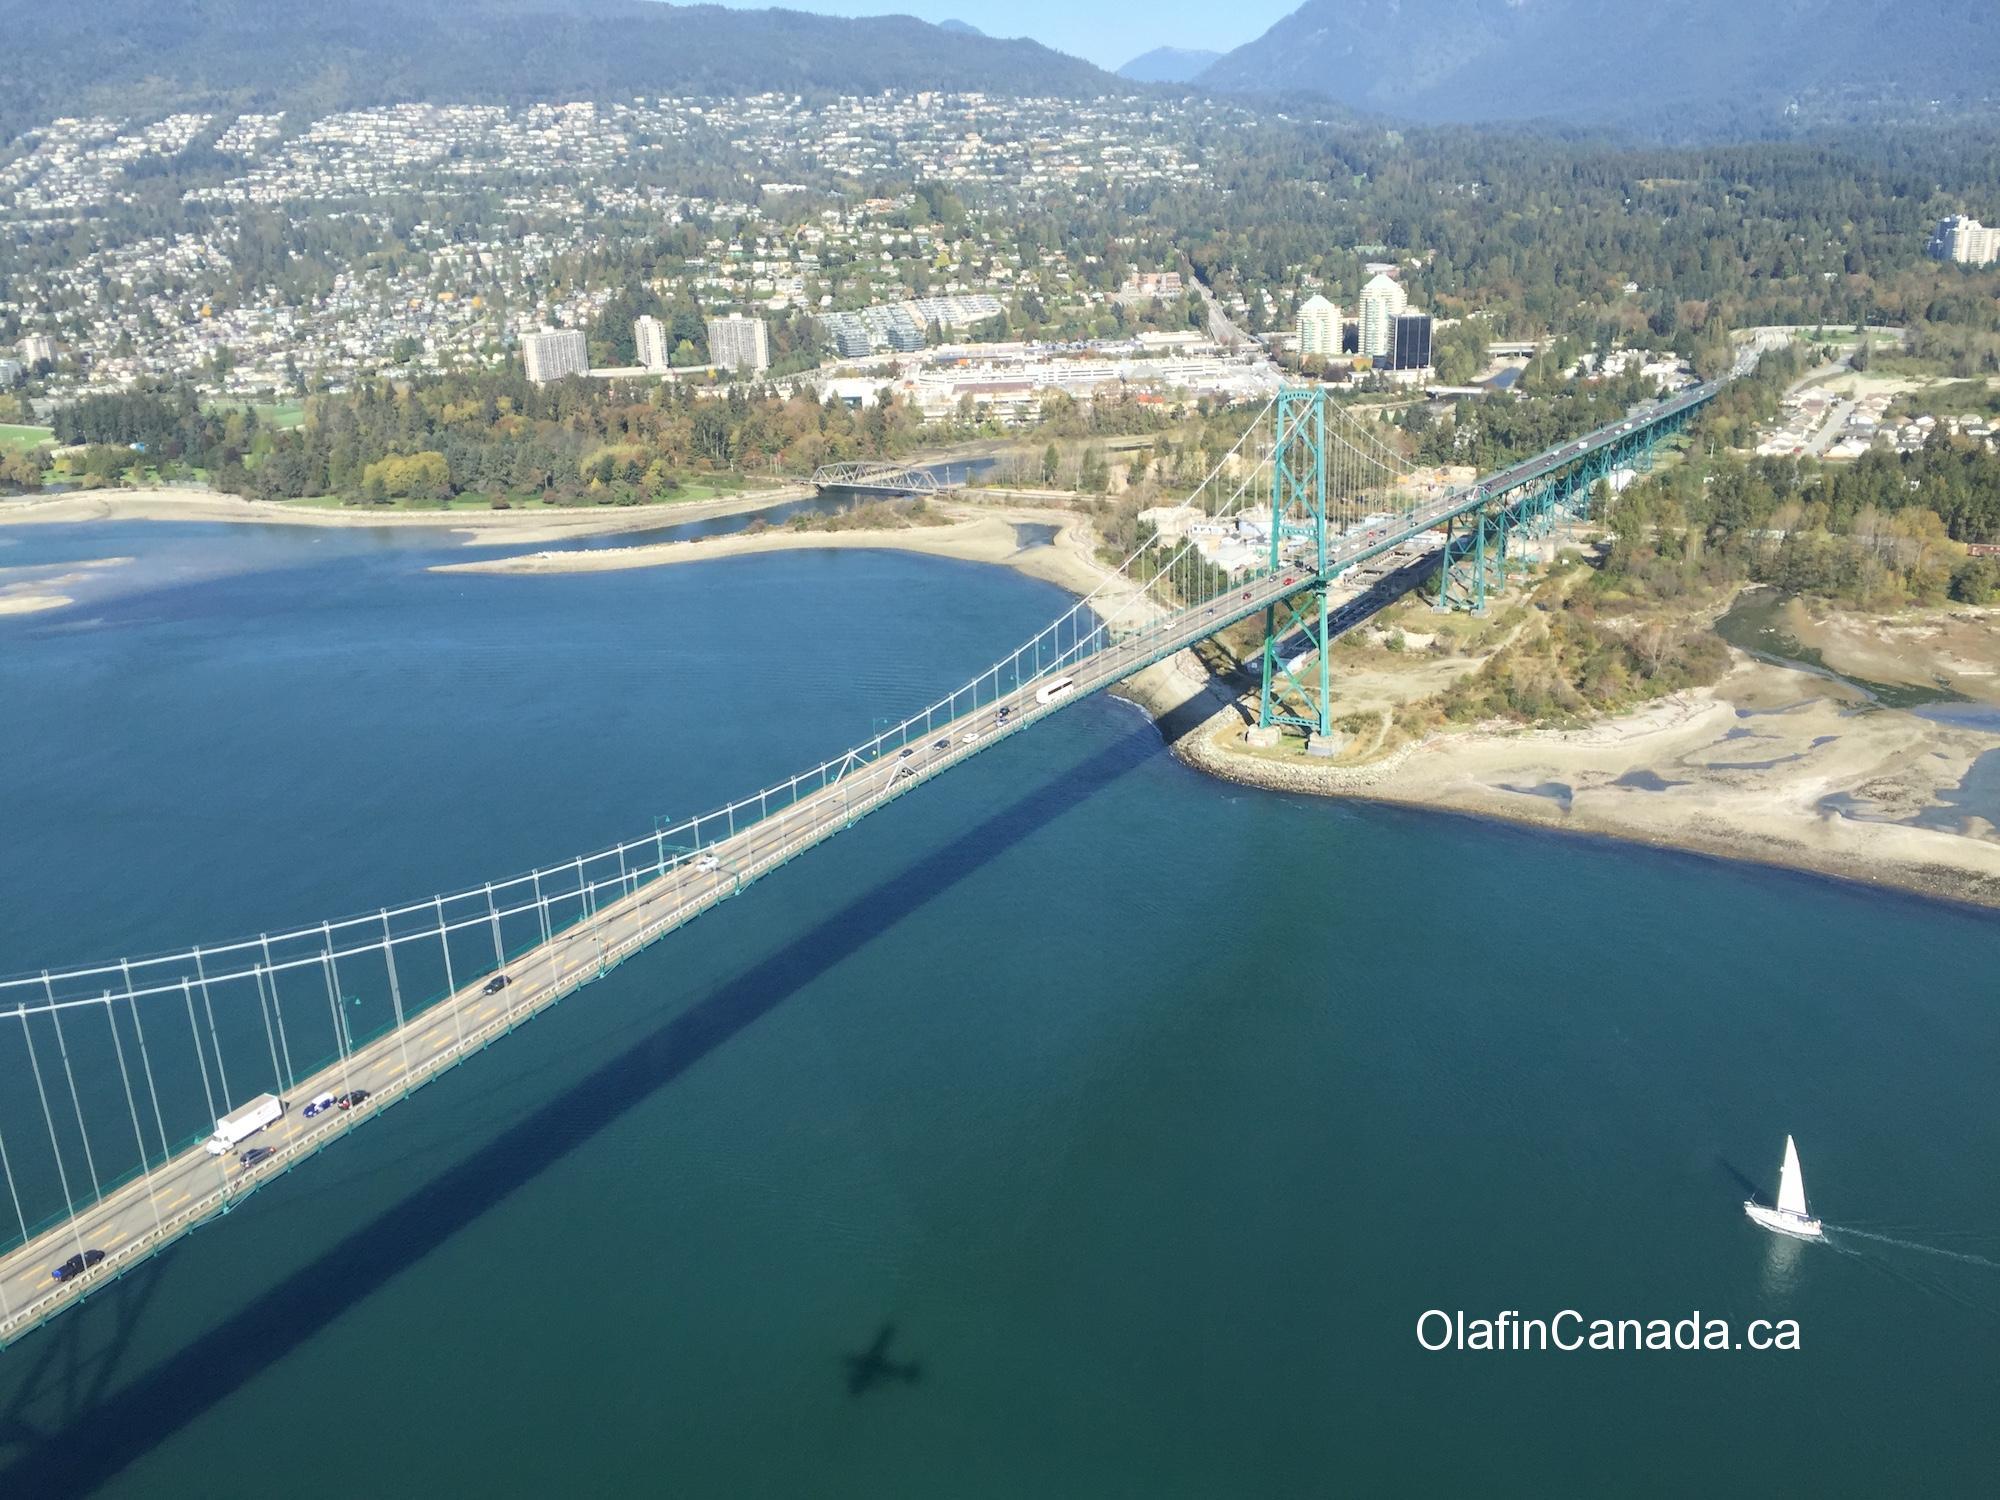 Lions Gate bridge Vancouver from the air by sea plane #olafincanada #britishcolumbia #discoverbc #vancouver #lionsgatebridge #seaplane